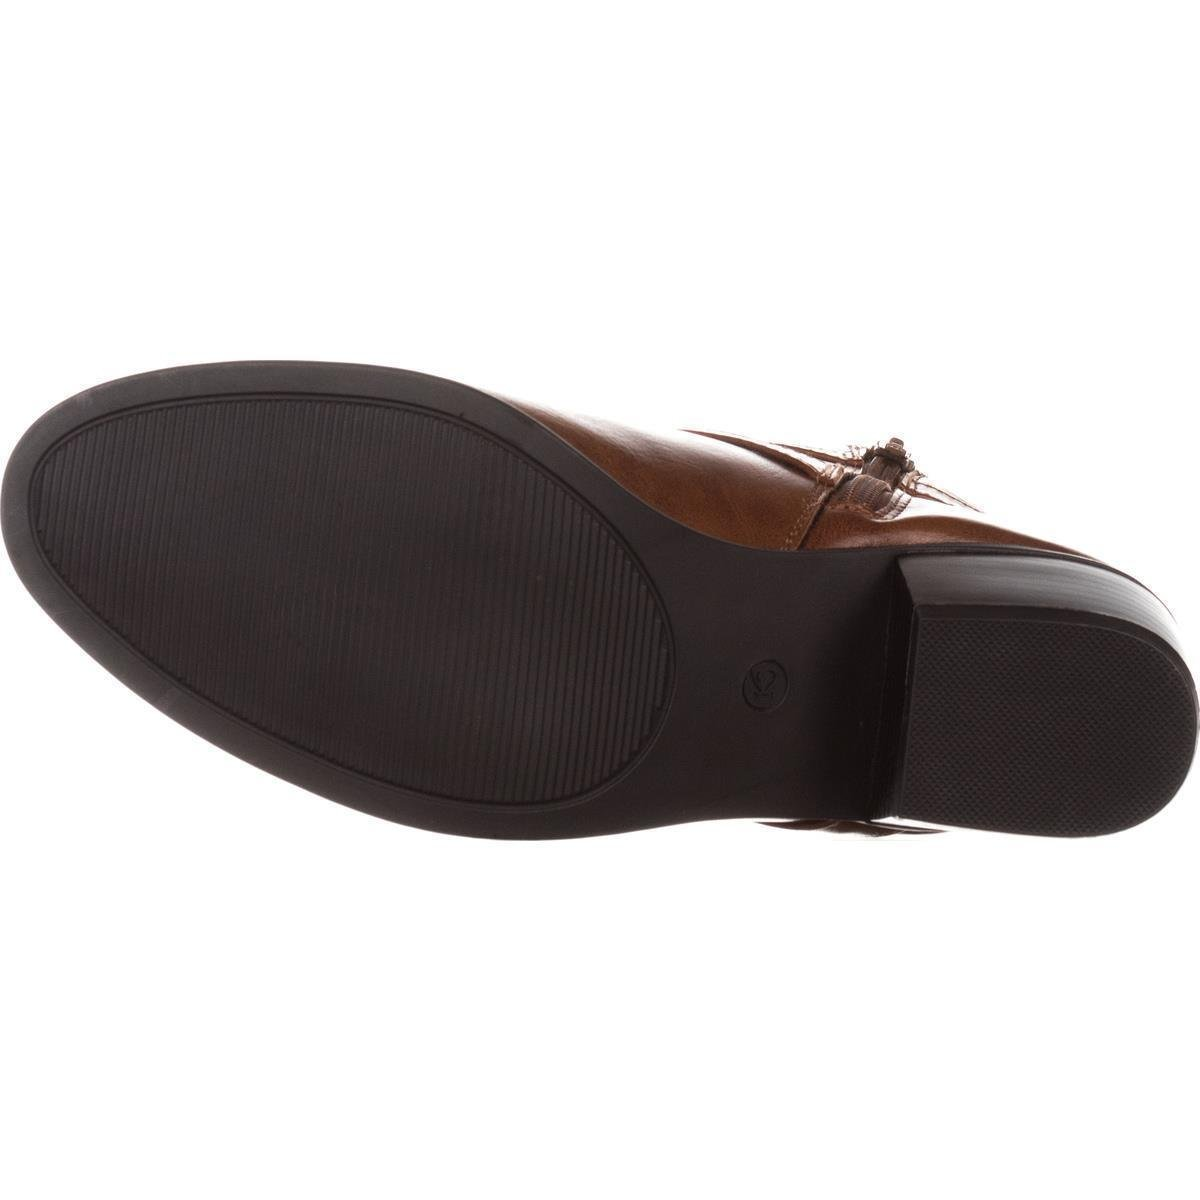 Size 7.5 Karen Scott Womens Falonn Leather Almond Toe Ankle Fashion Cognac